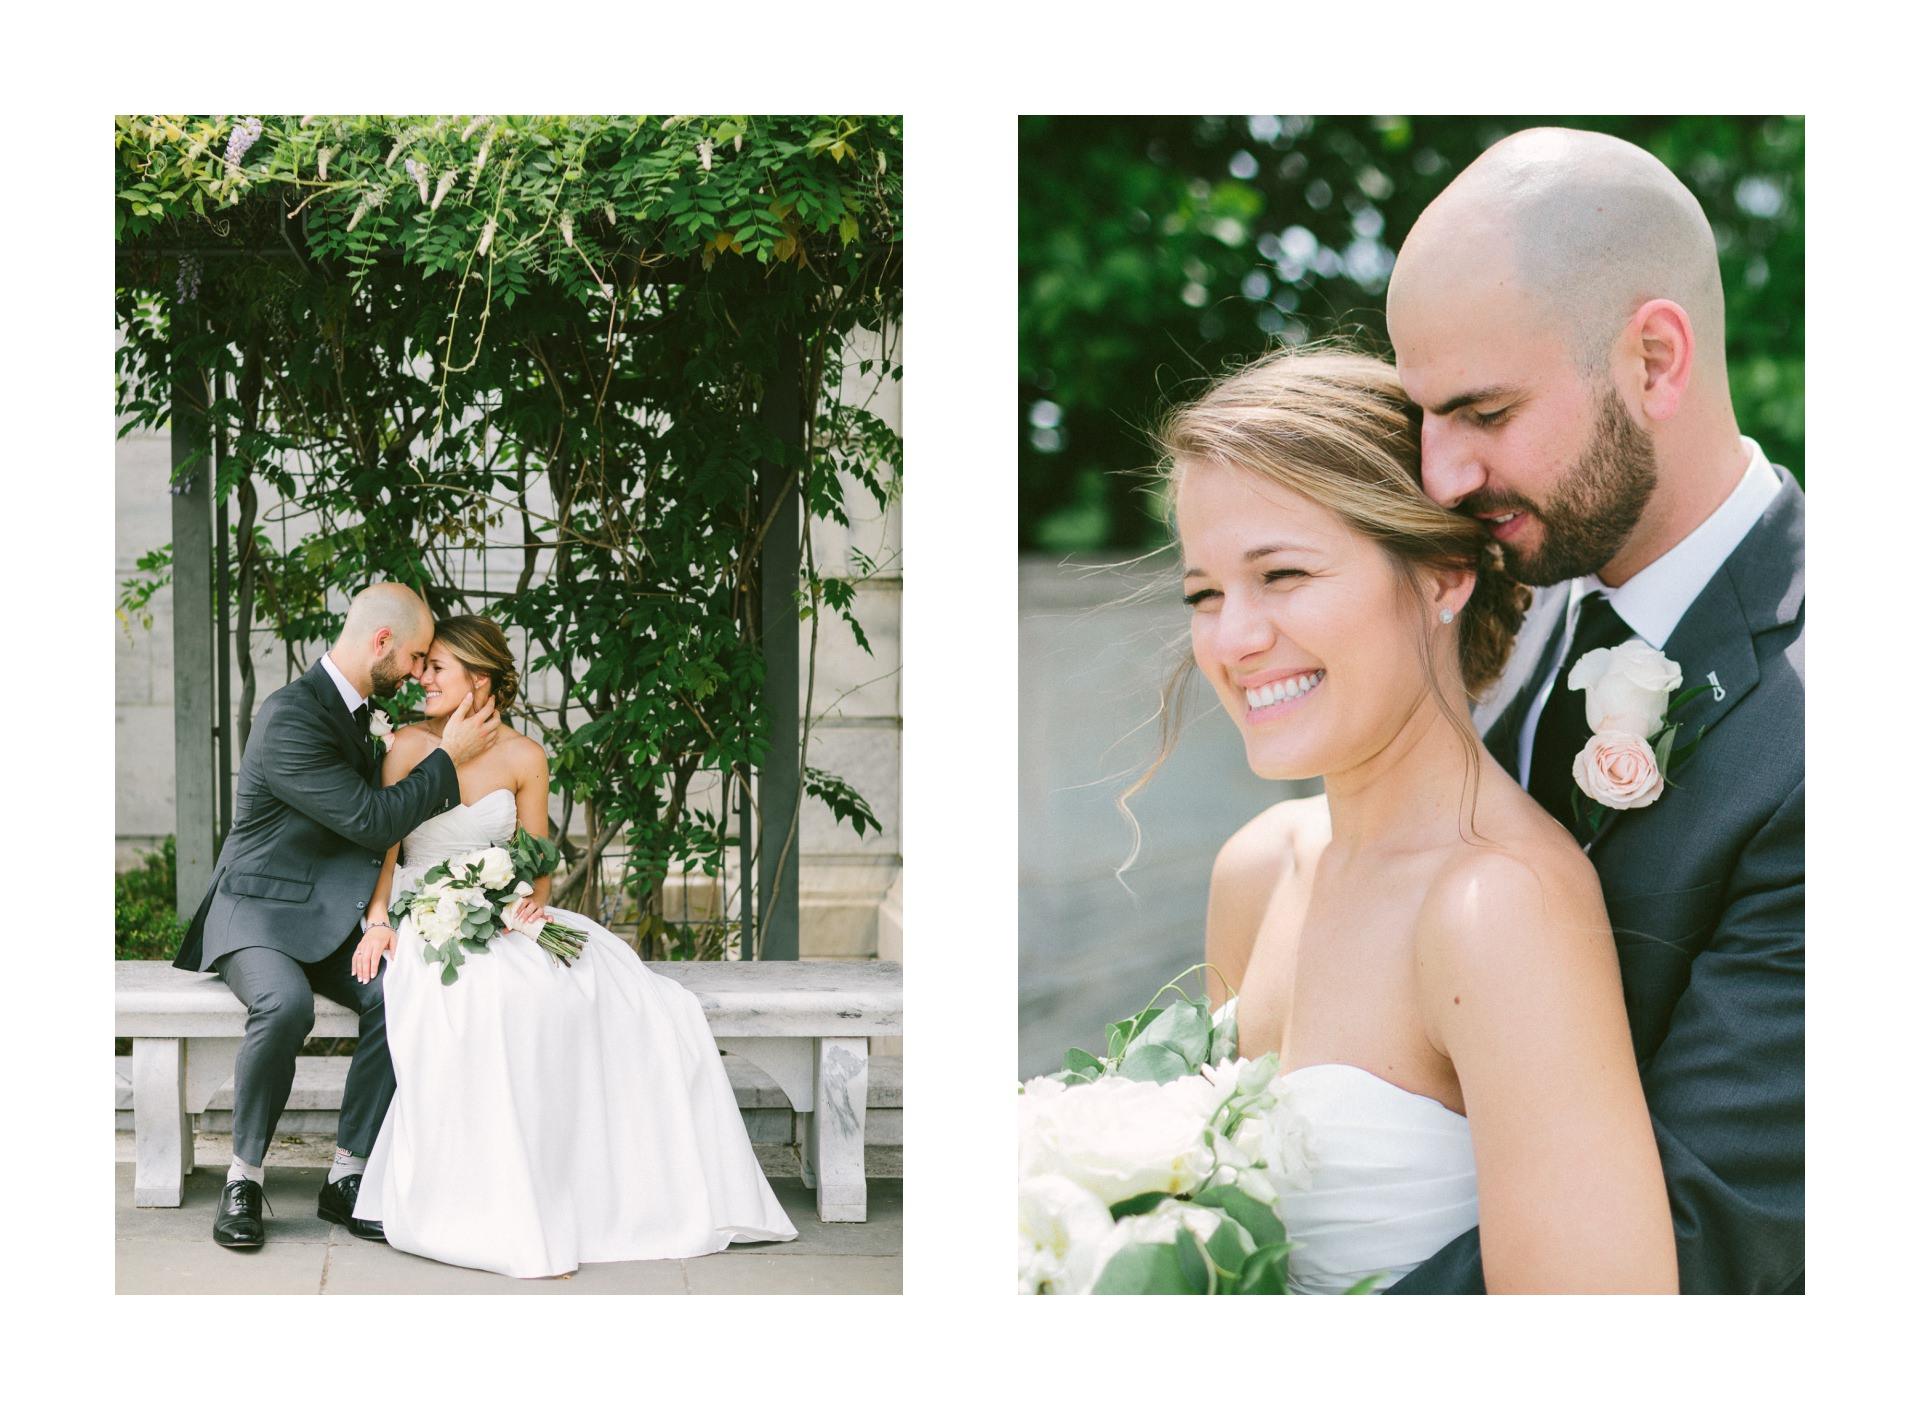 Dowtown Hilton Cleveland Wedding Photographer 1 45.jpg